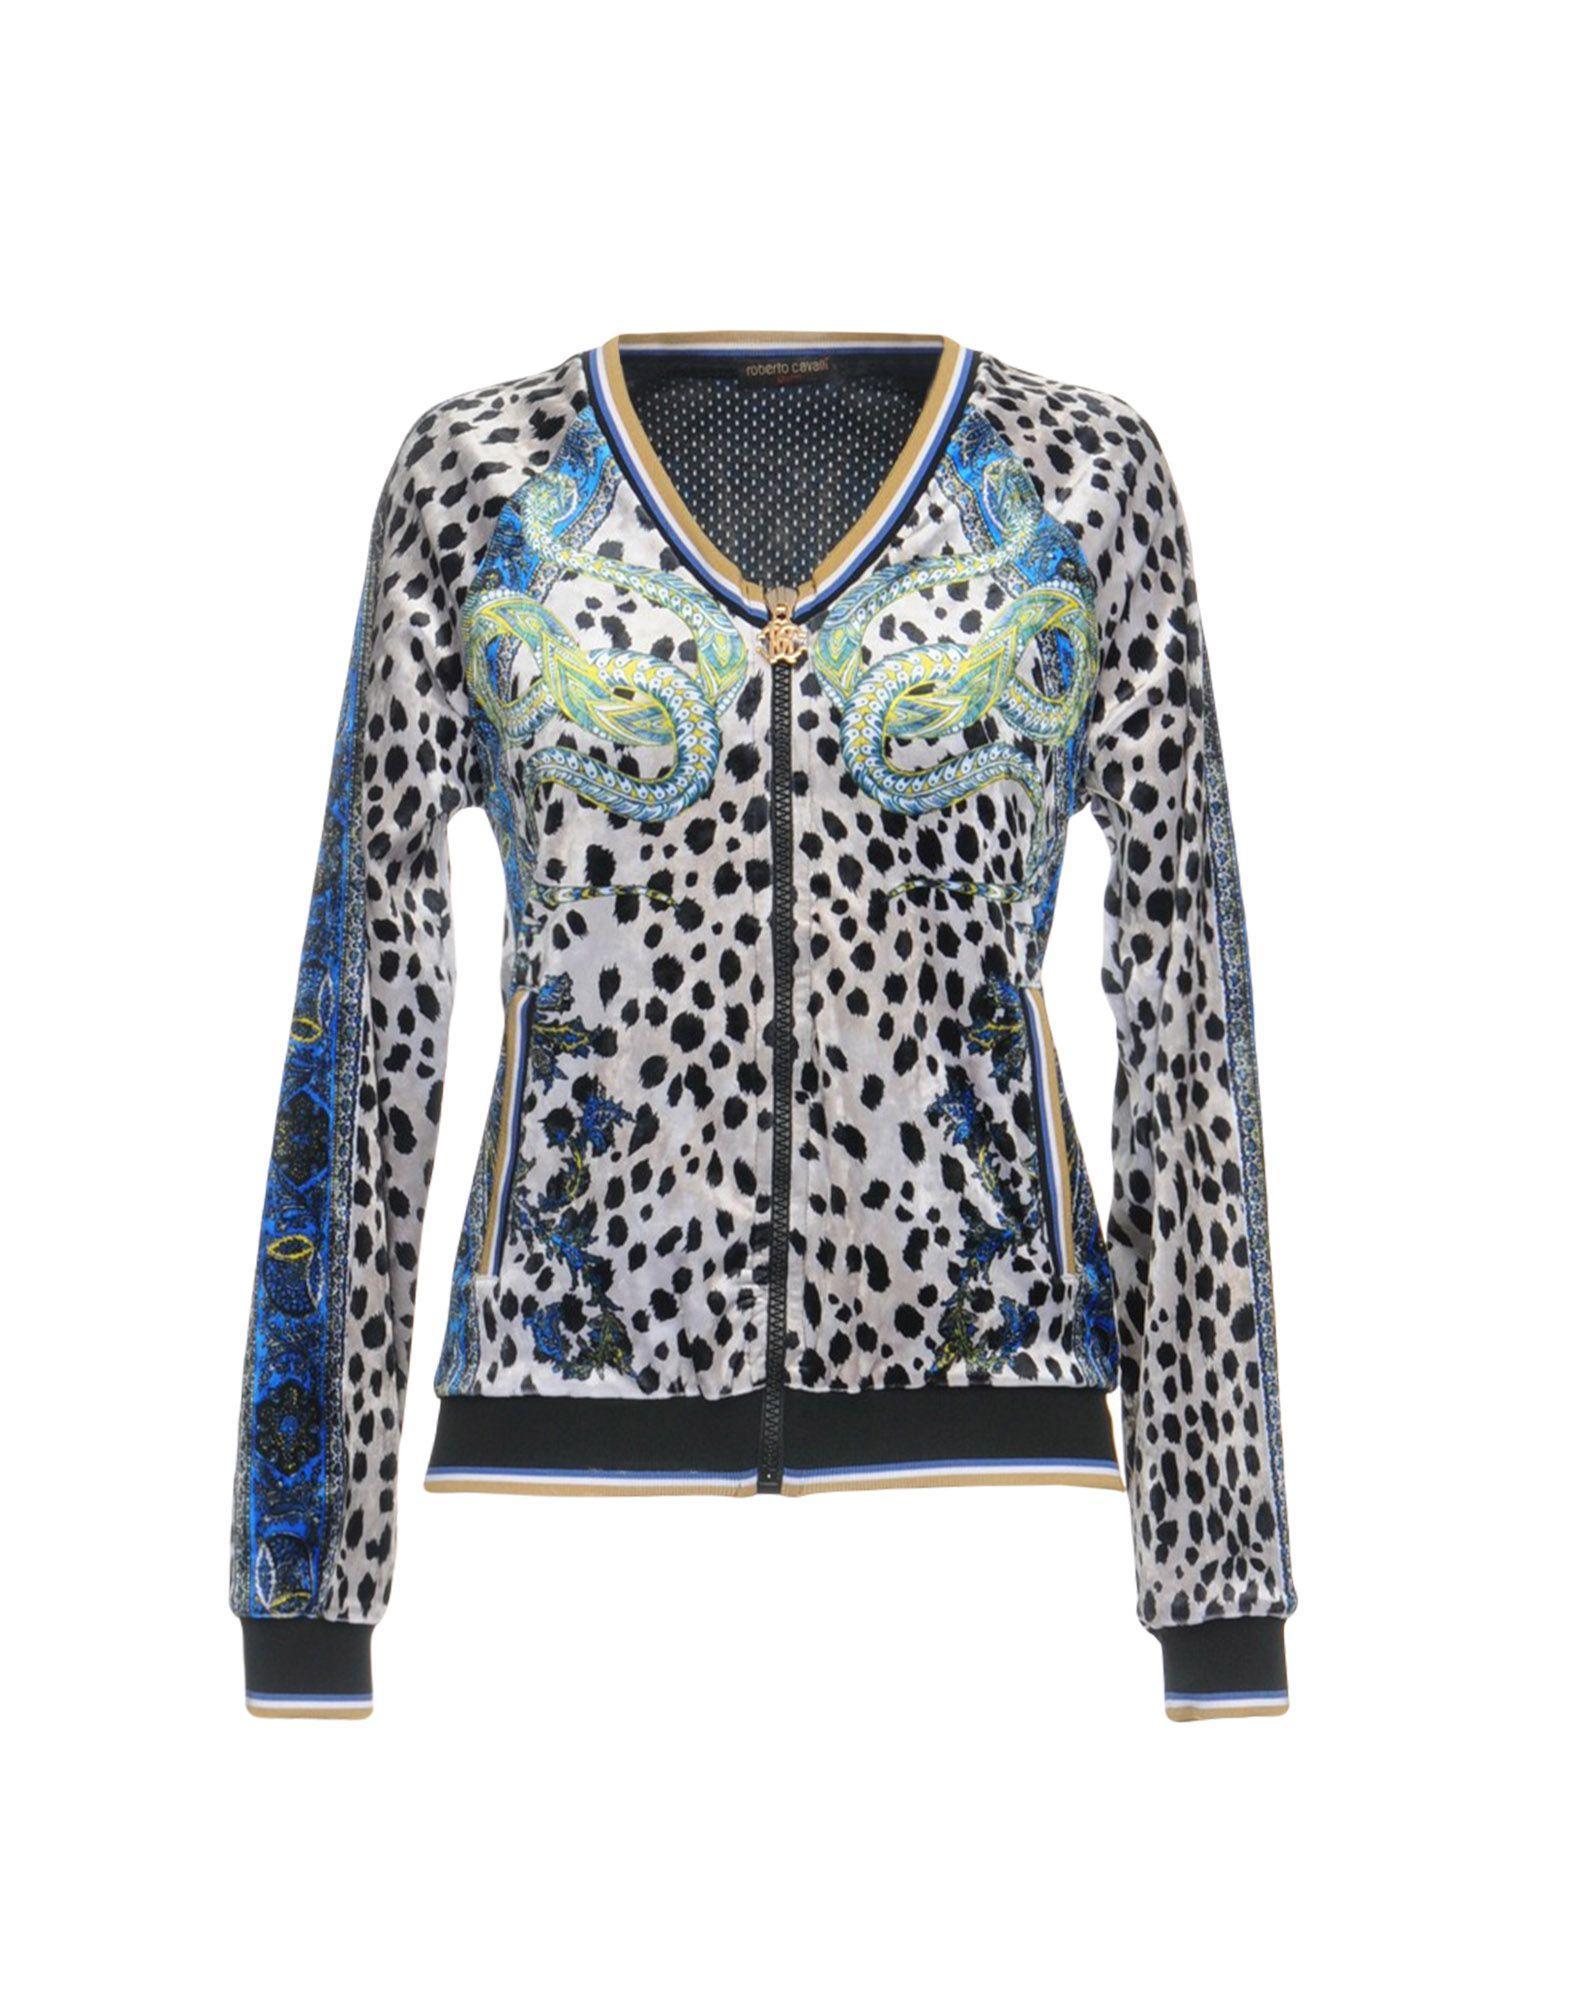 Roberto Cavalli Gym Sweatshirts In Blue